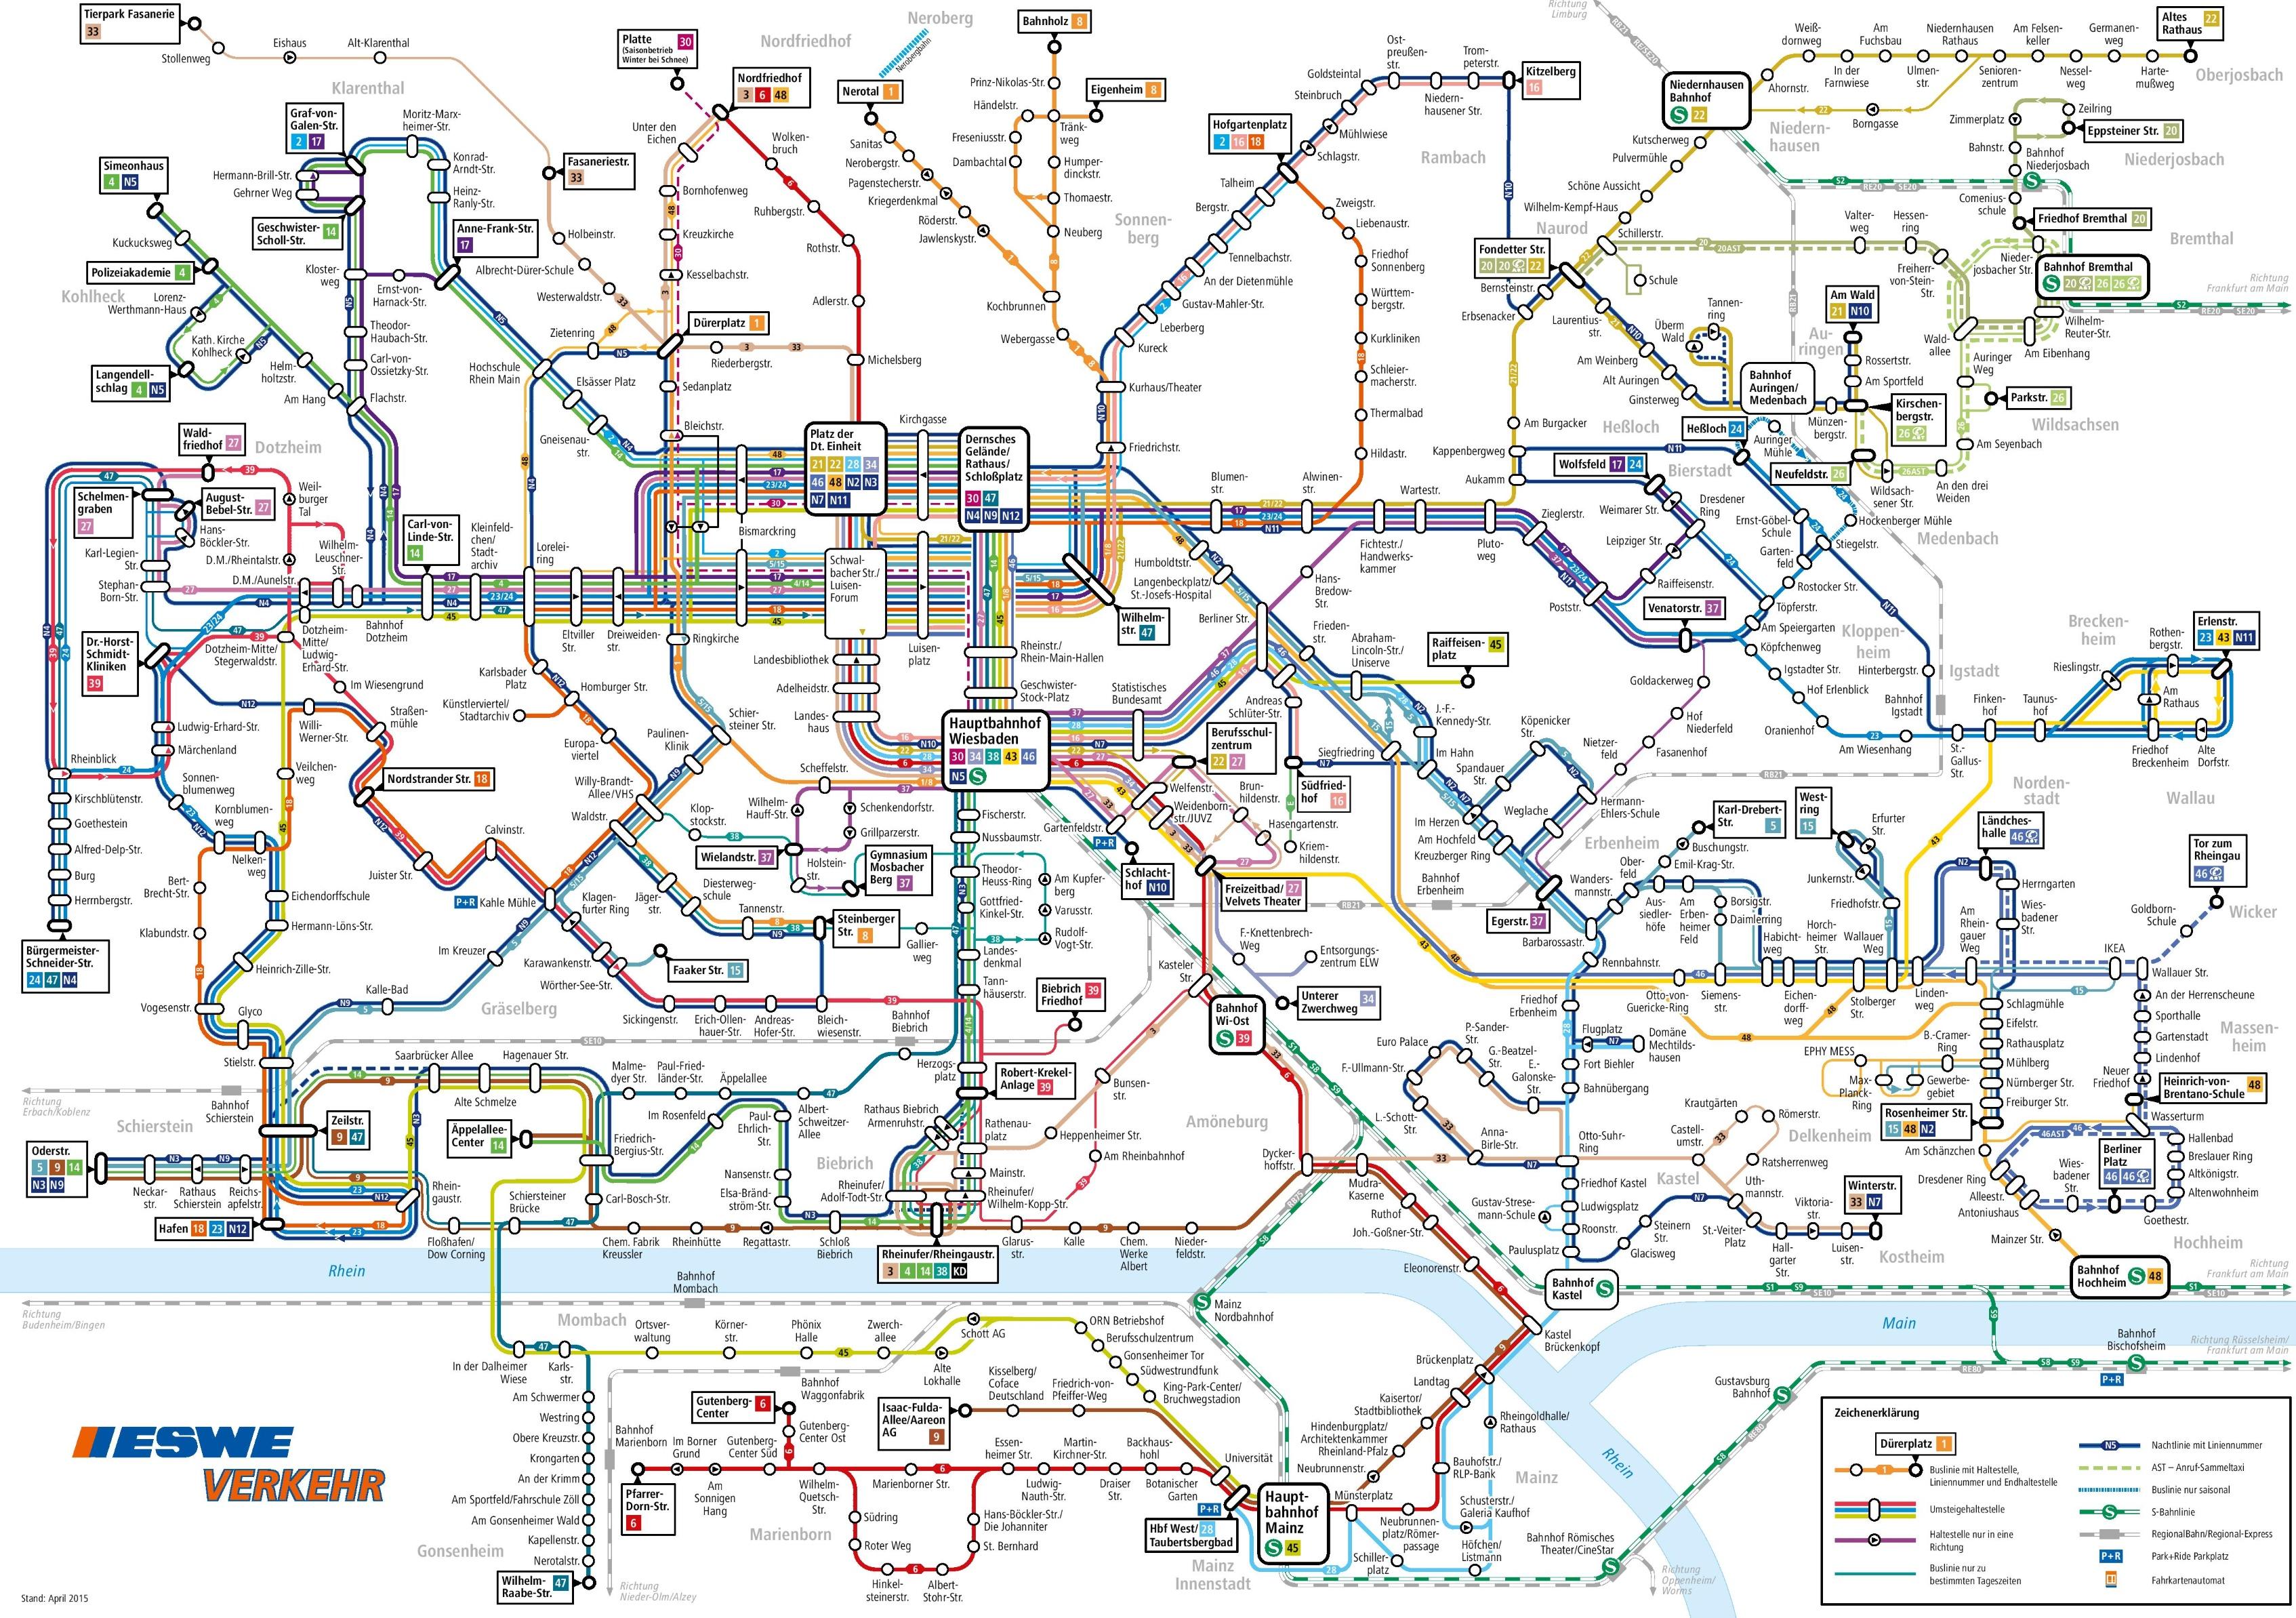 Wiesbaden transport map